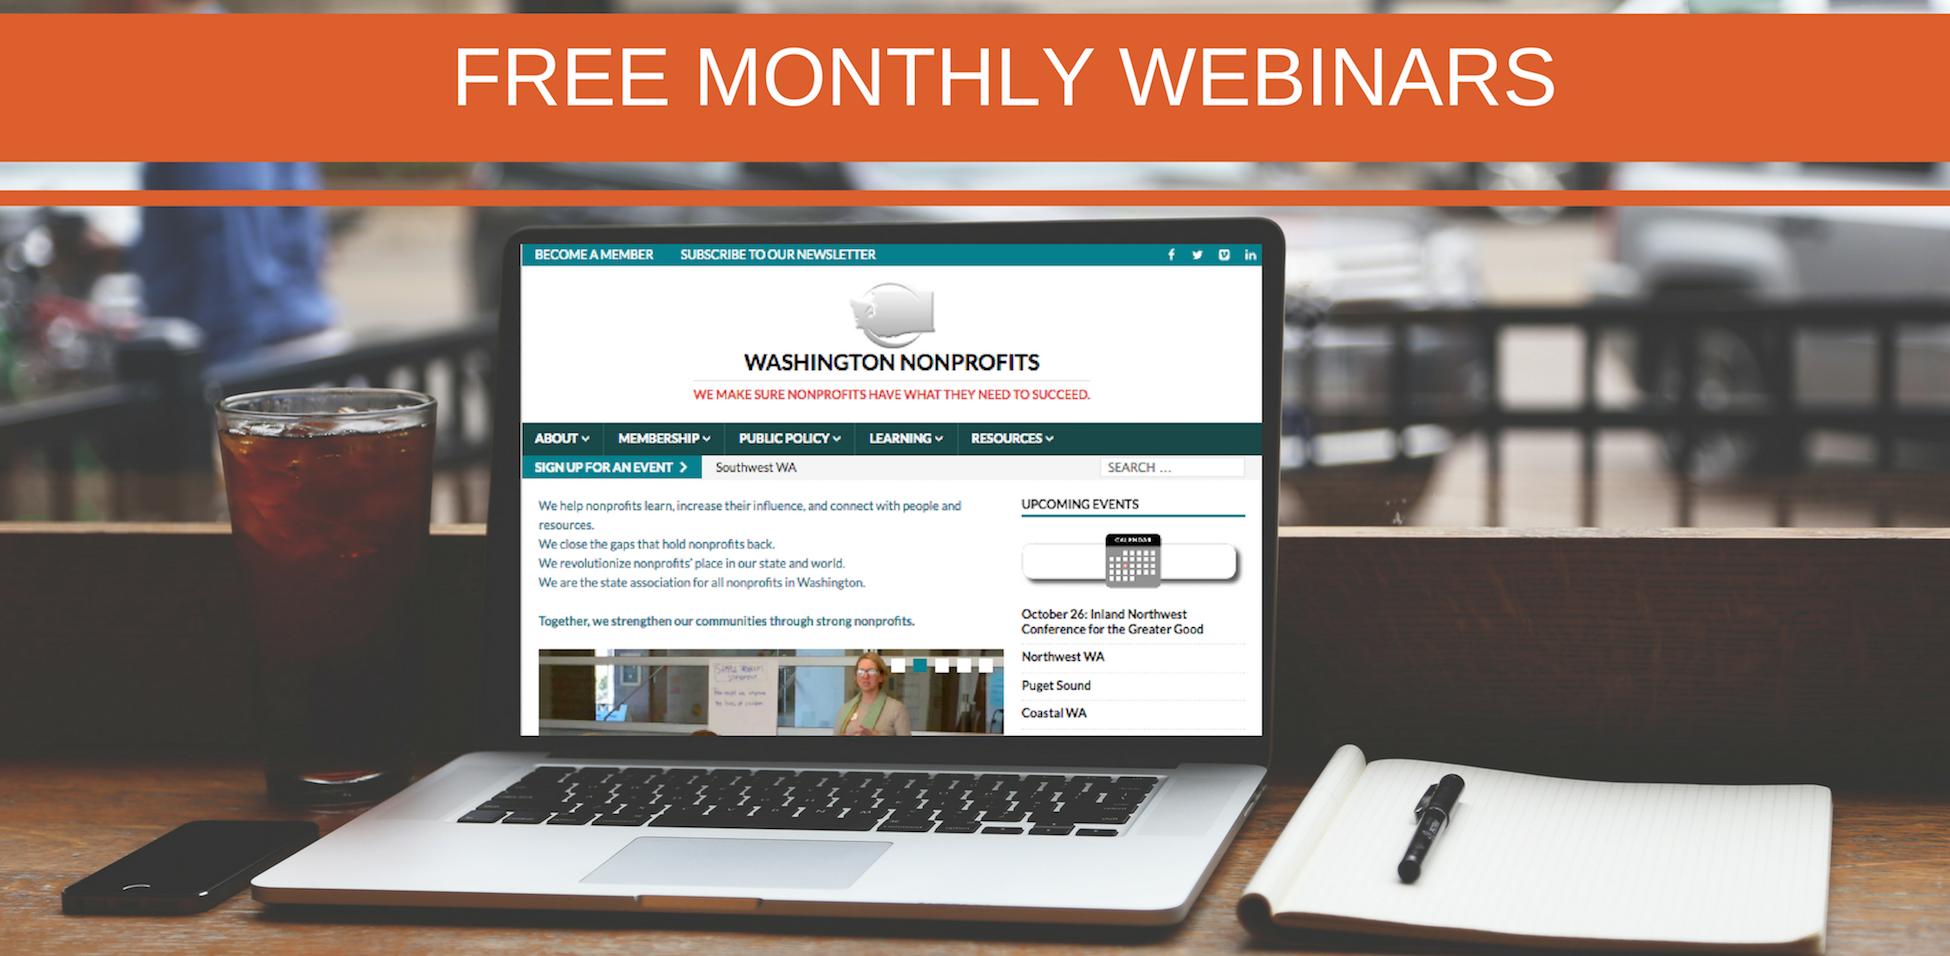 Cvent WN Free Monthly Webinars Banner